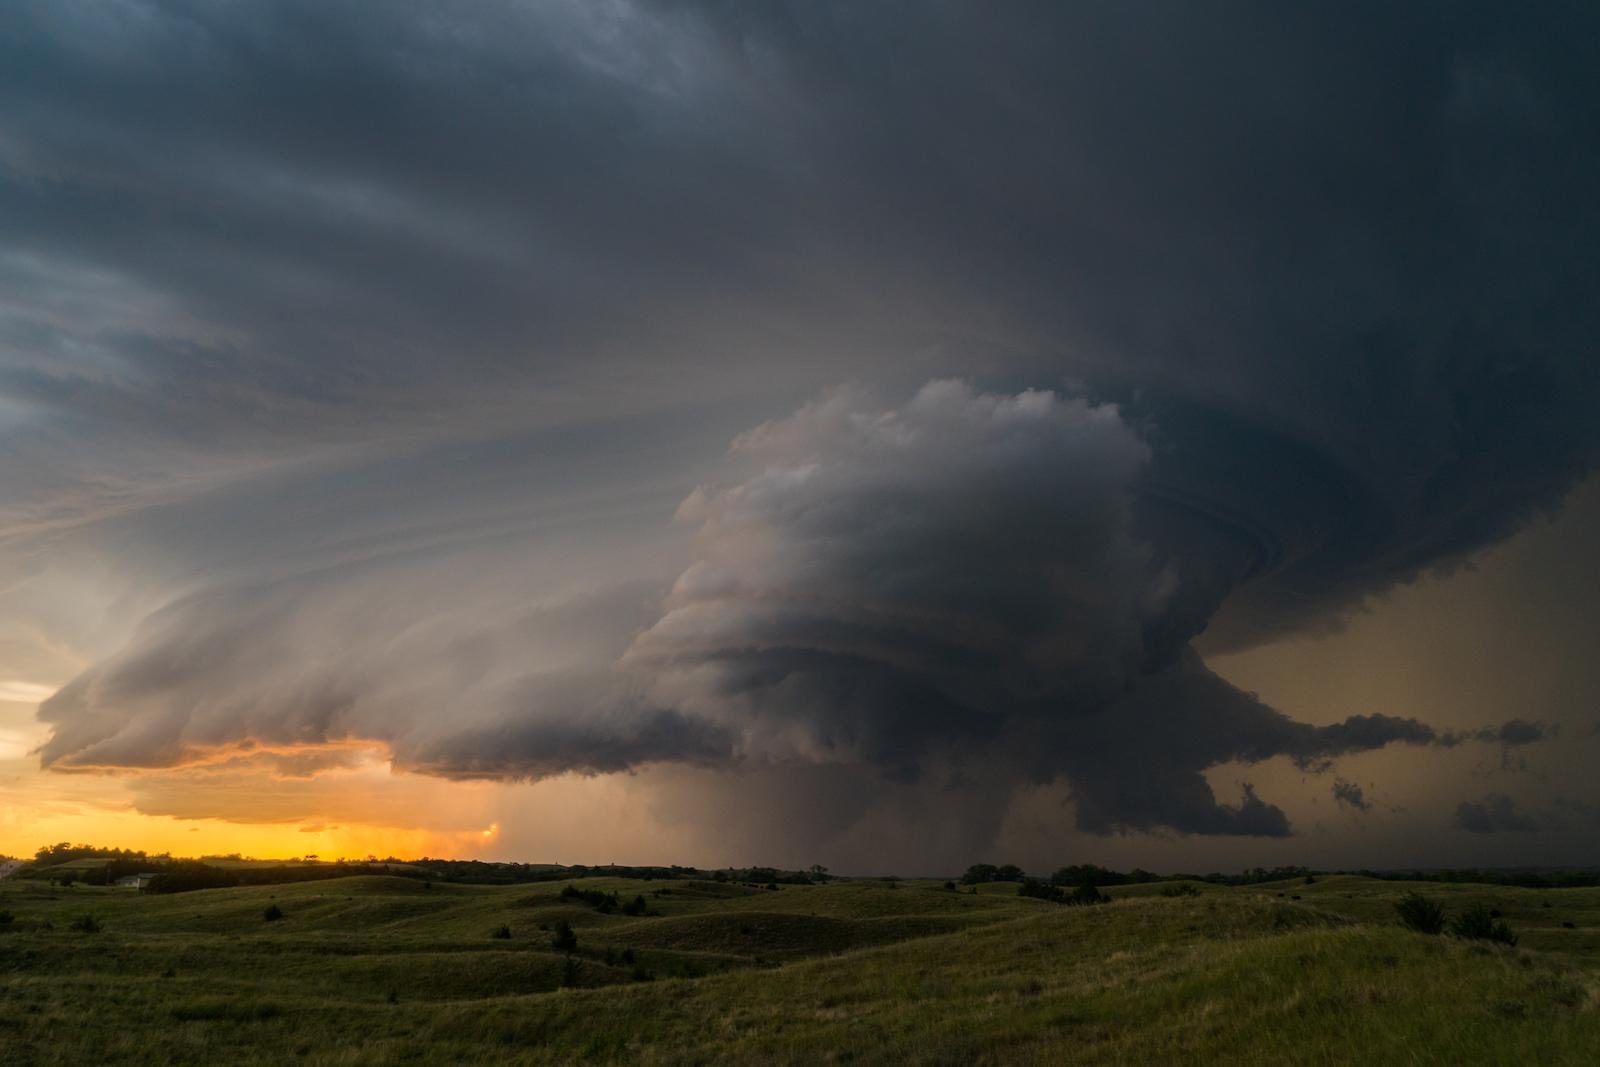 Taylor, Nebraska. August 19, 2017